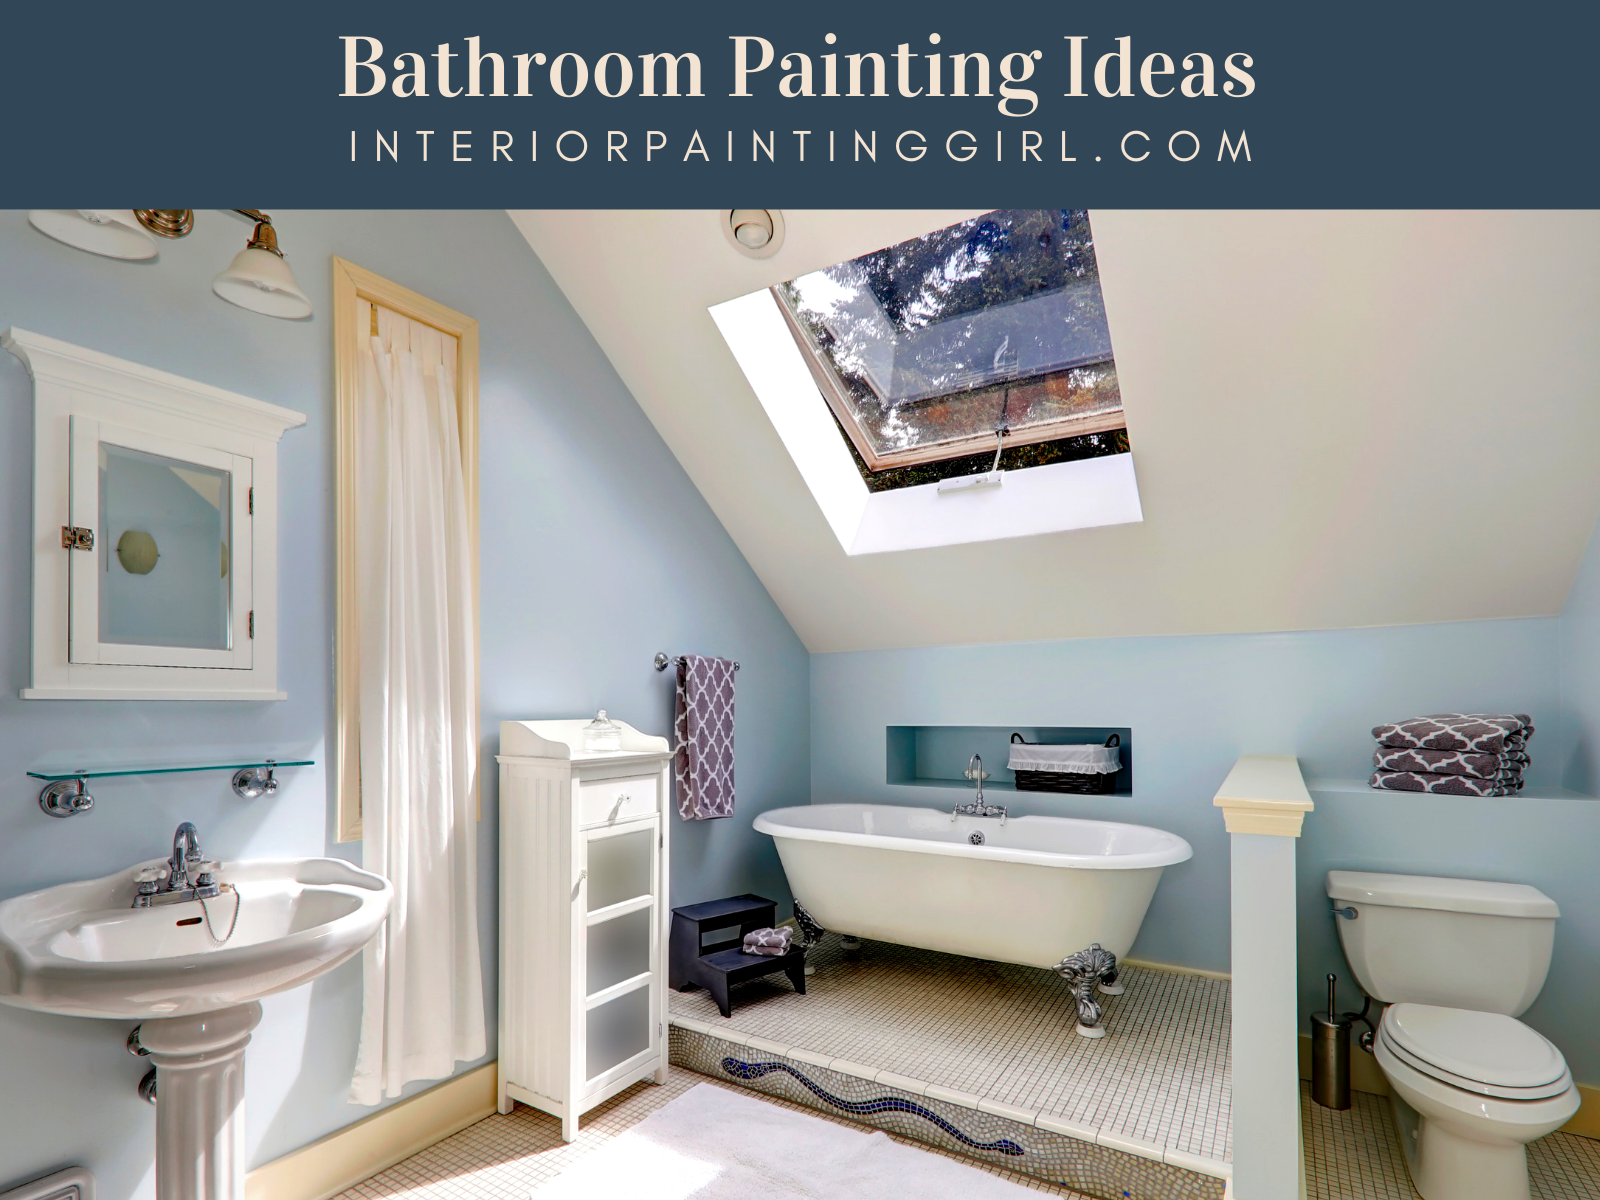 Bathroom Painting Ideas - Sandy & Nautical Themes - THAT Interior Painting Girl